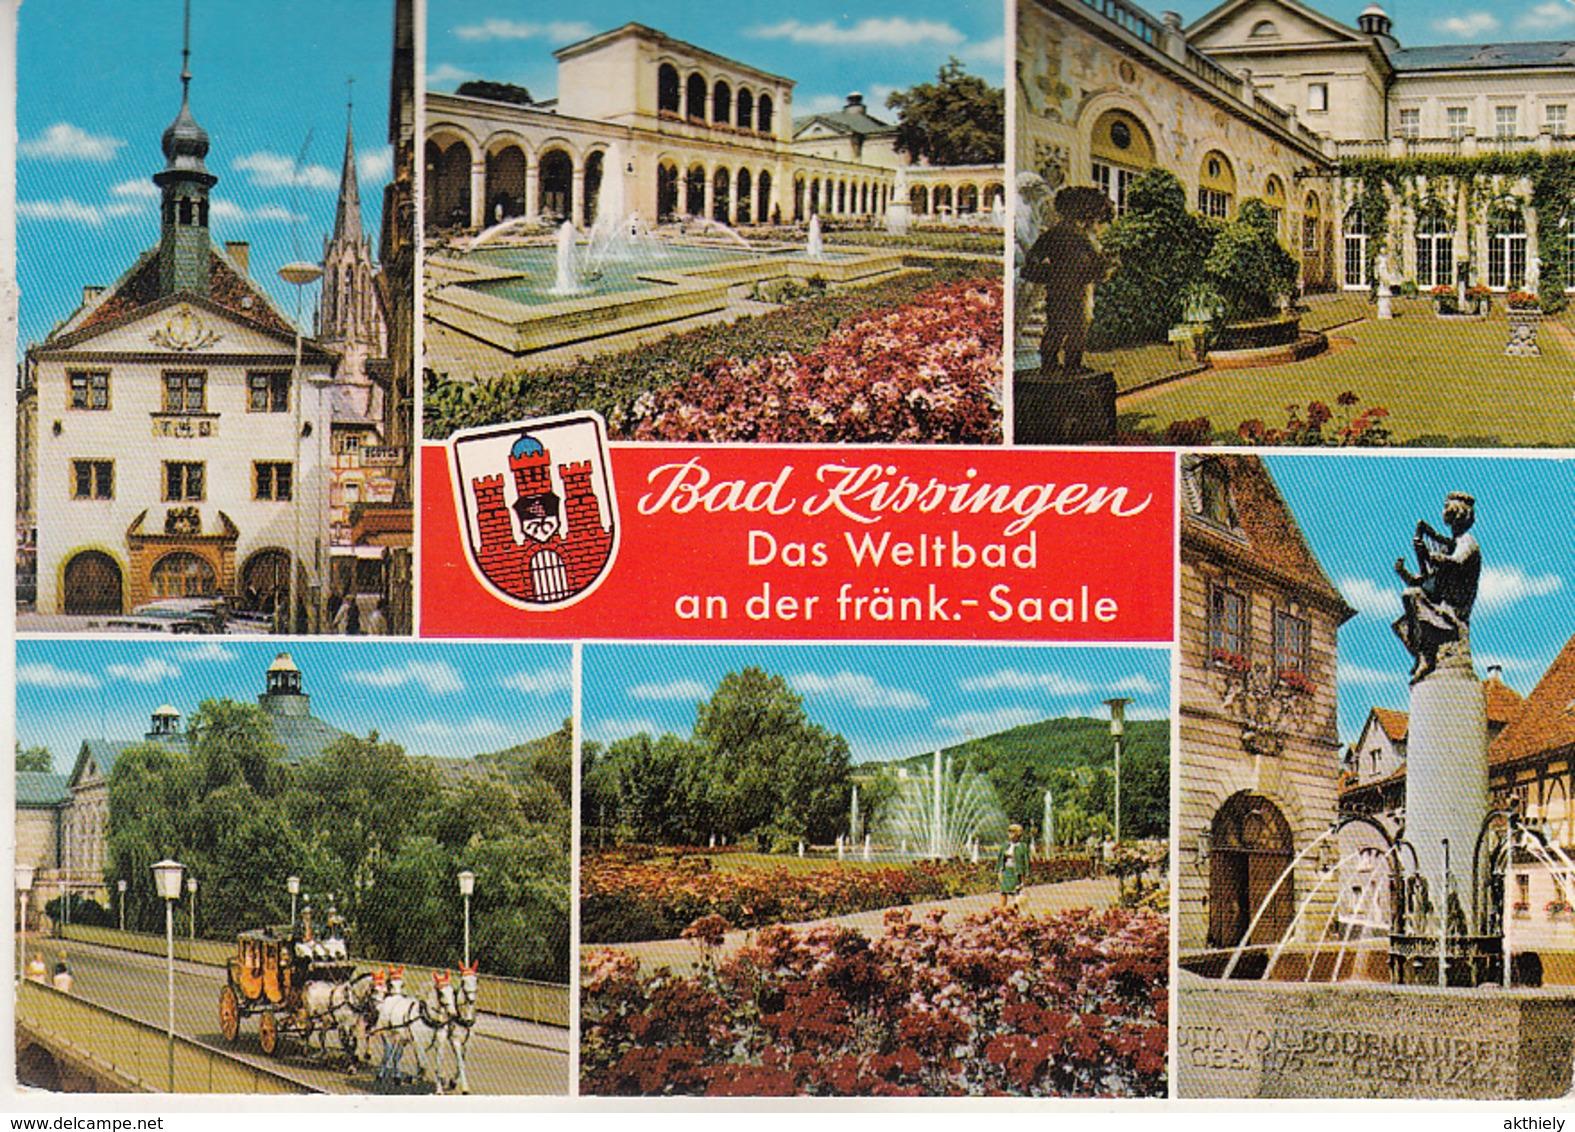 Bad Kissingen Ak135940 - Bad Kissingen